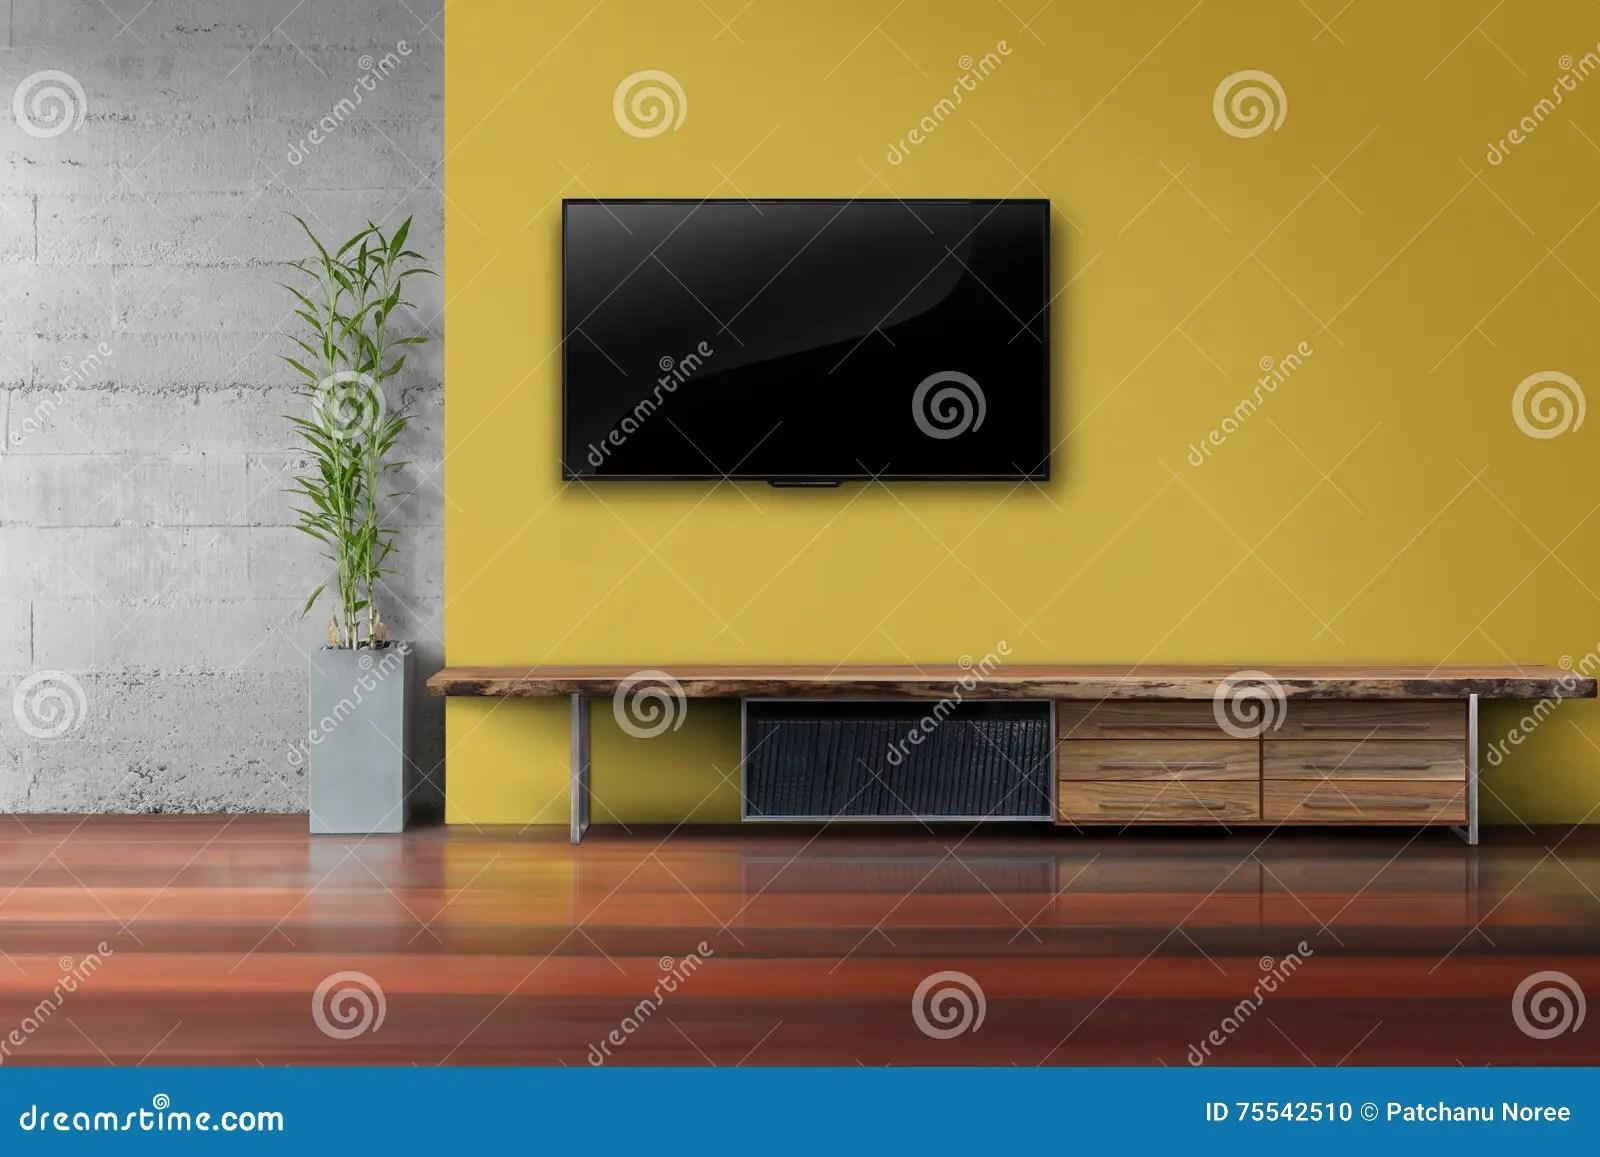 Woonkamer Geleide TV Op Gele Muur Met Houten Lijstmedia